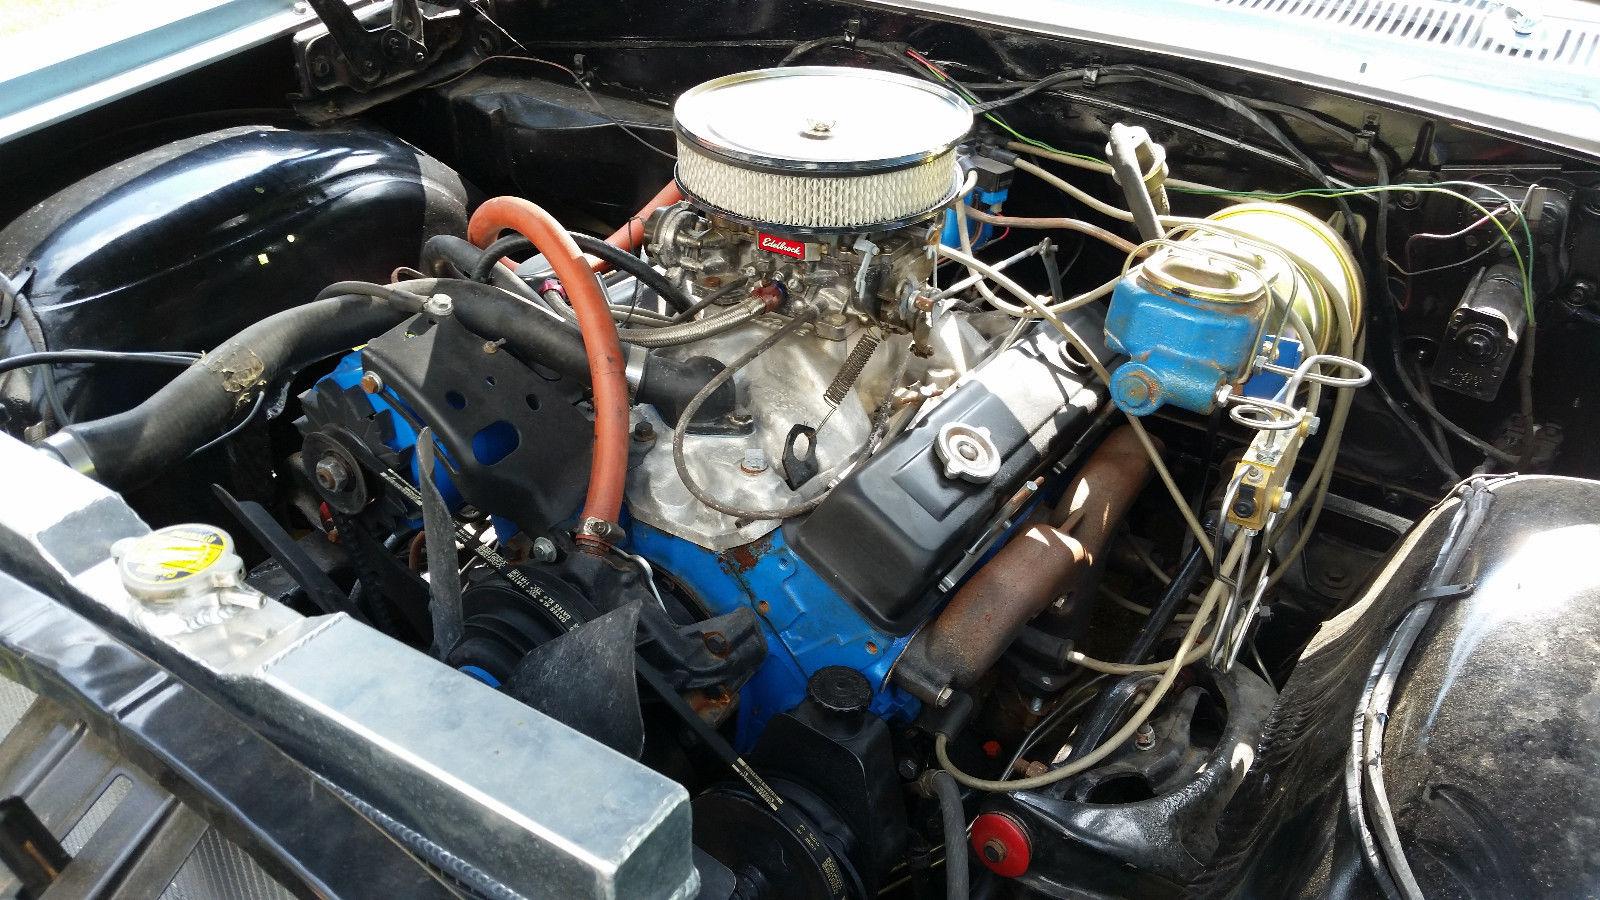 Chevrolet Impala N.c.